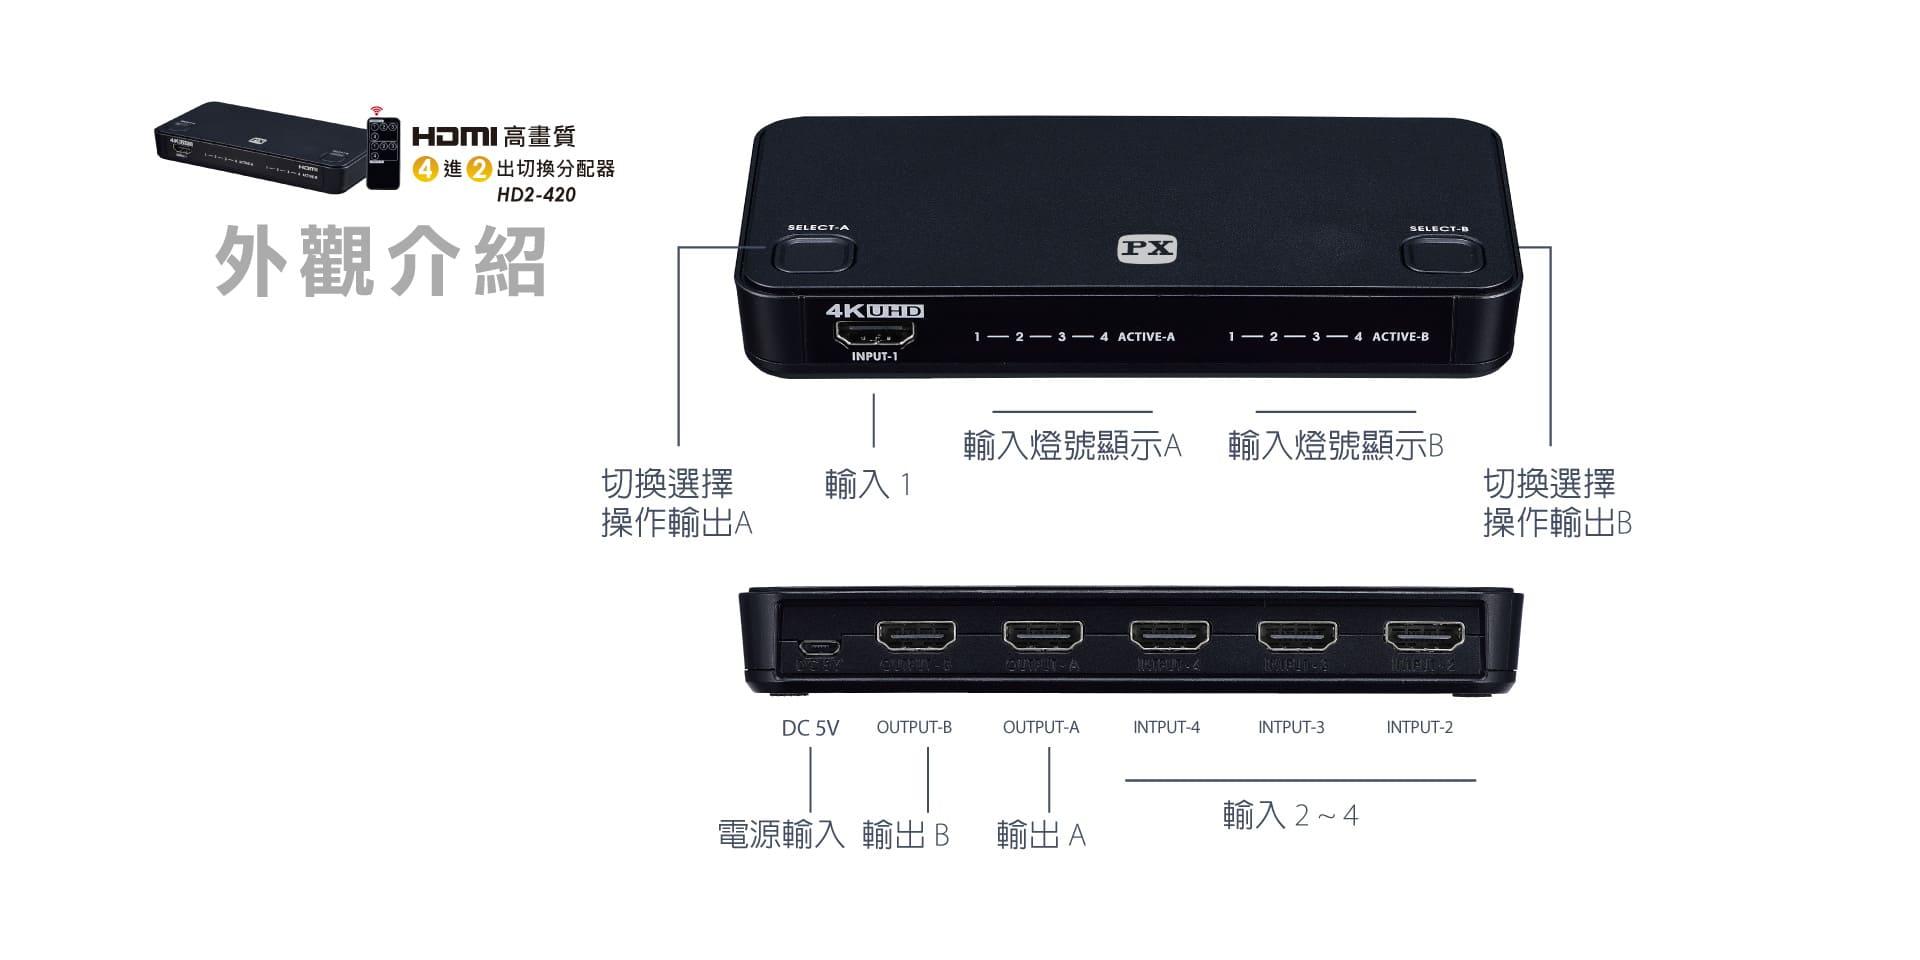 proimages/product/HDMI/HD2-420/HD2-420_06.jpg